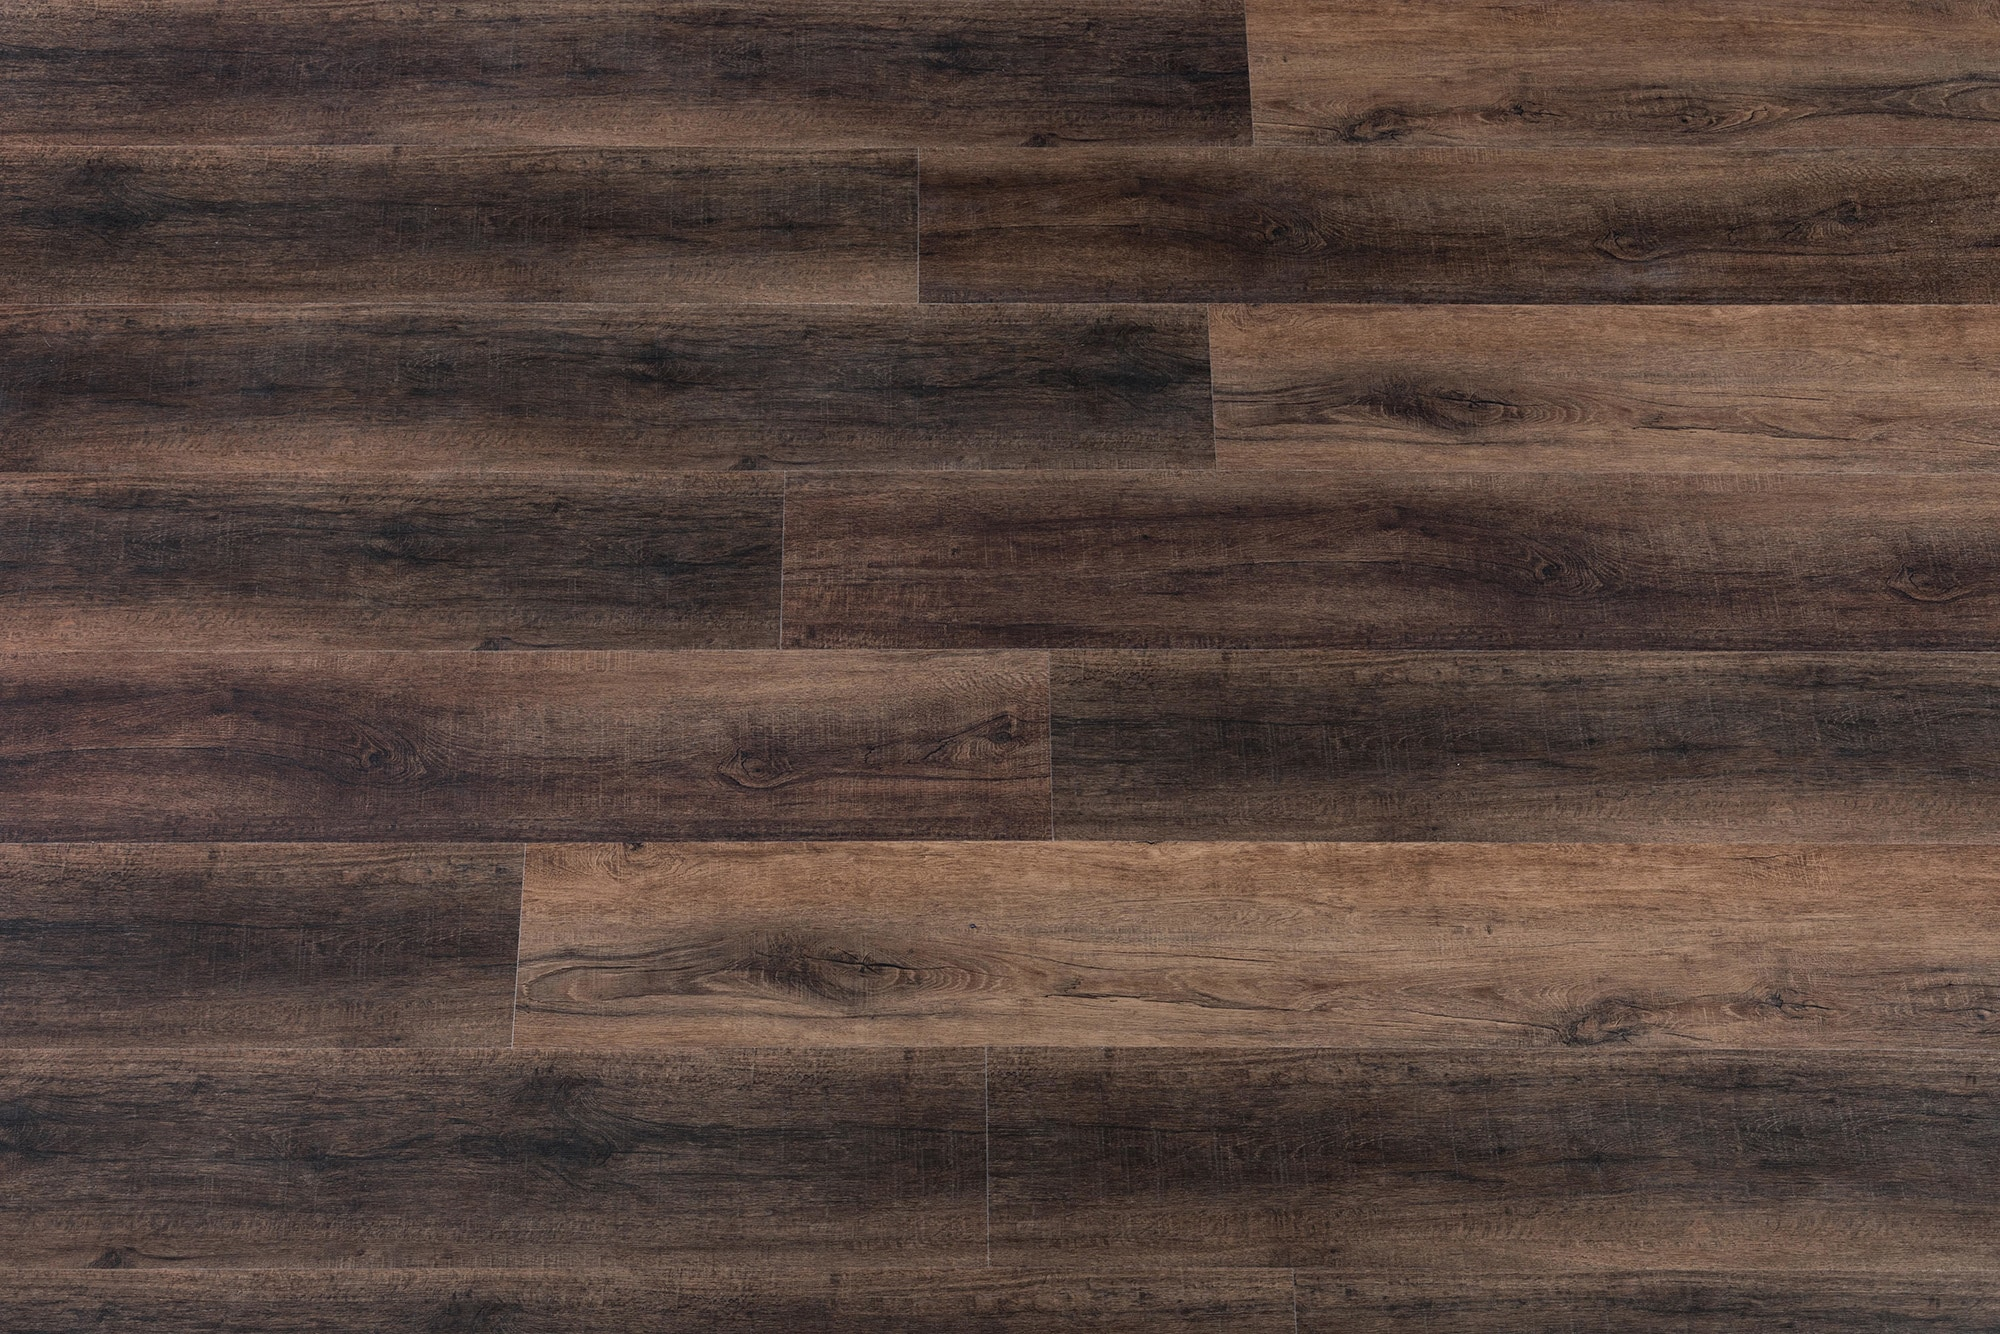 Brown Sawn French Oak / 6.5mm / SPC / Click Lock Vinyl Planks - 6.5mm SPC Click Lock - XL Jumbo Collection 0